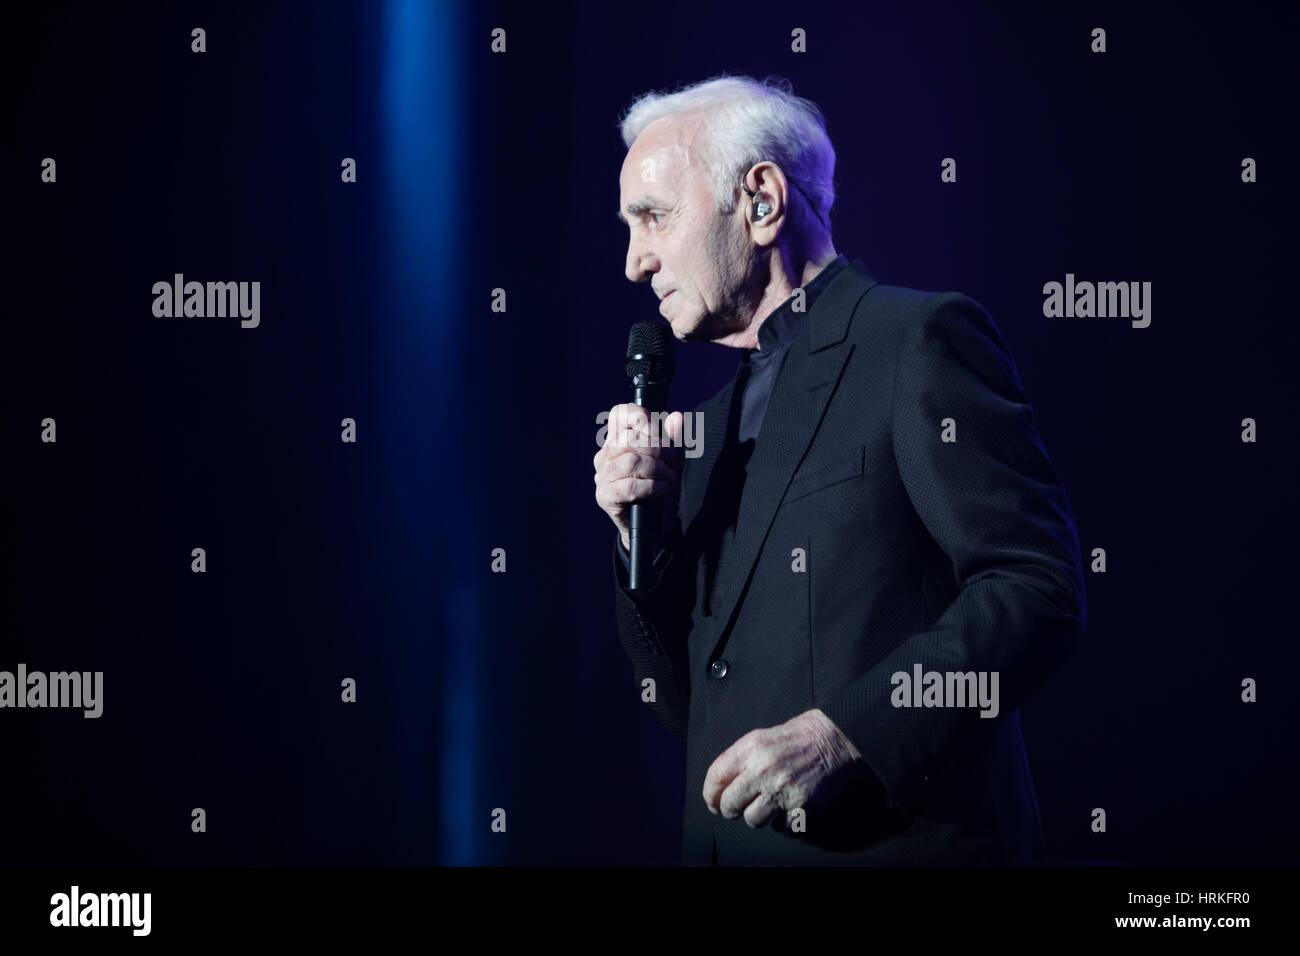 Charles Aznavour Stock Photos & Charles Aznavour Stock